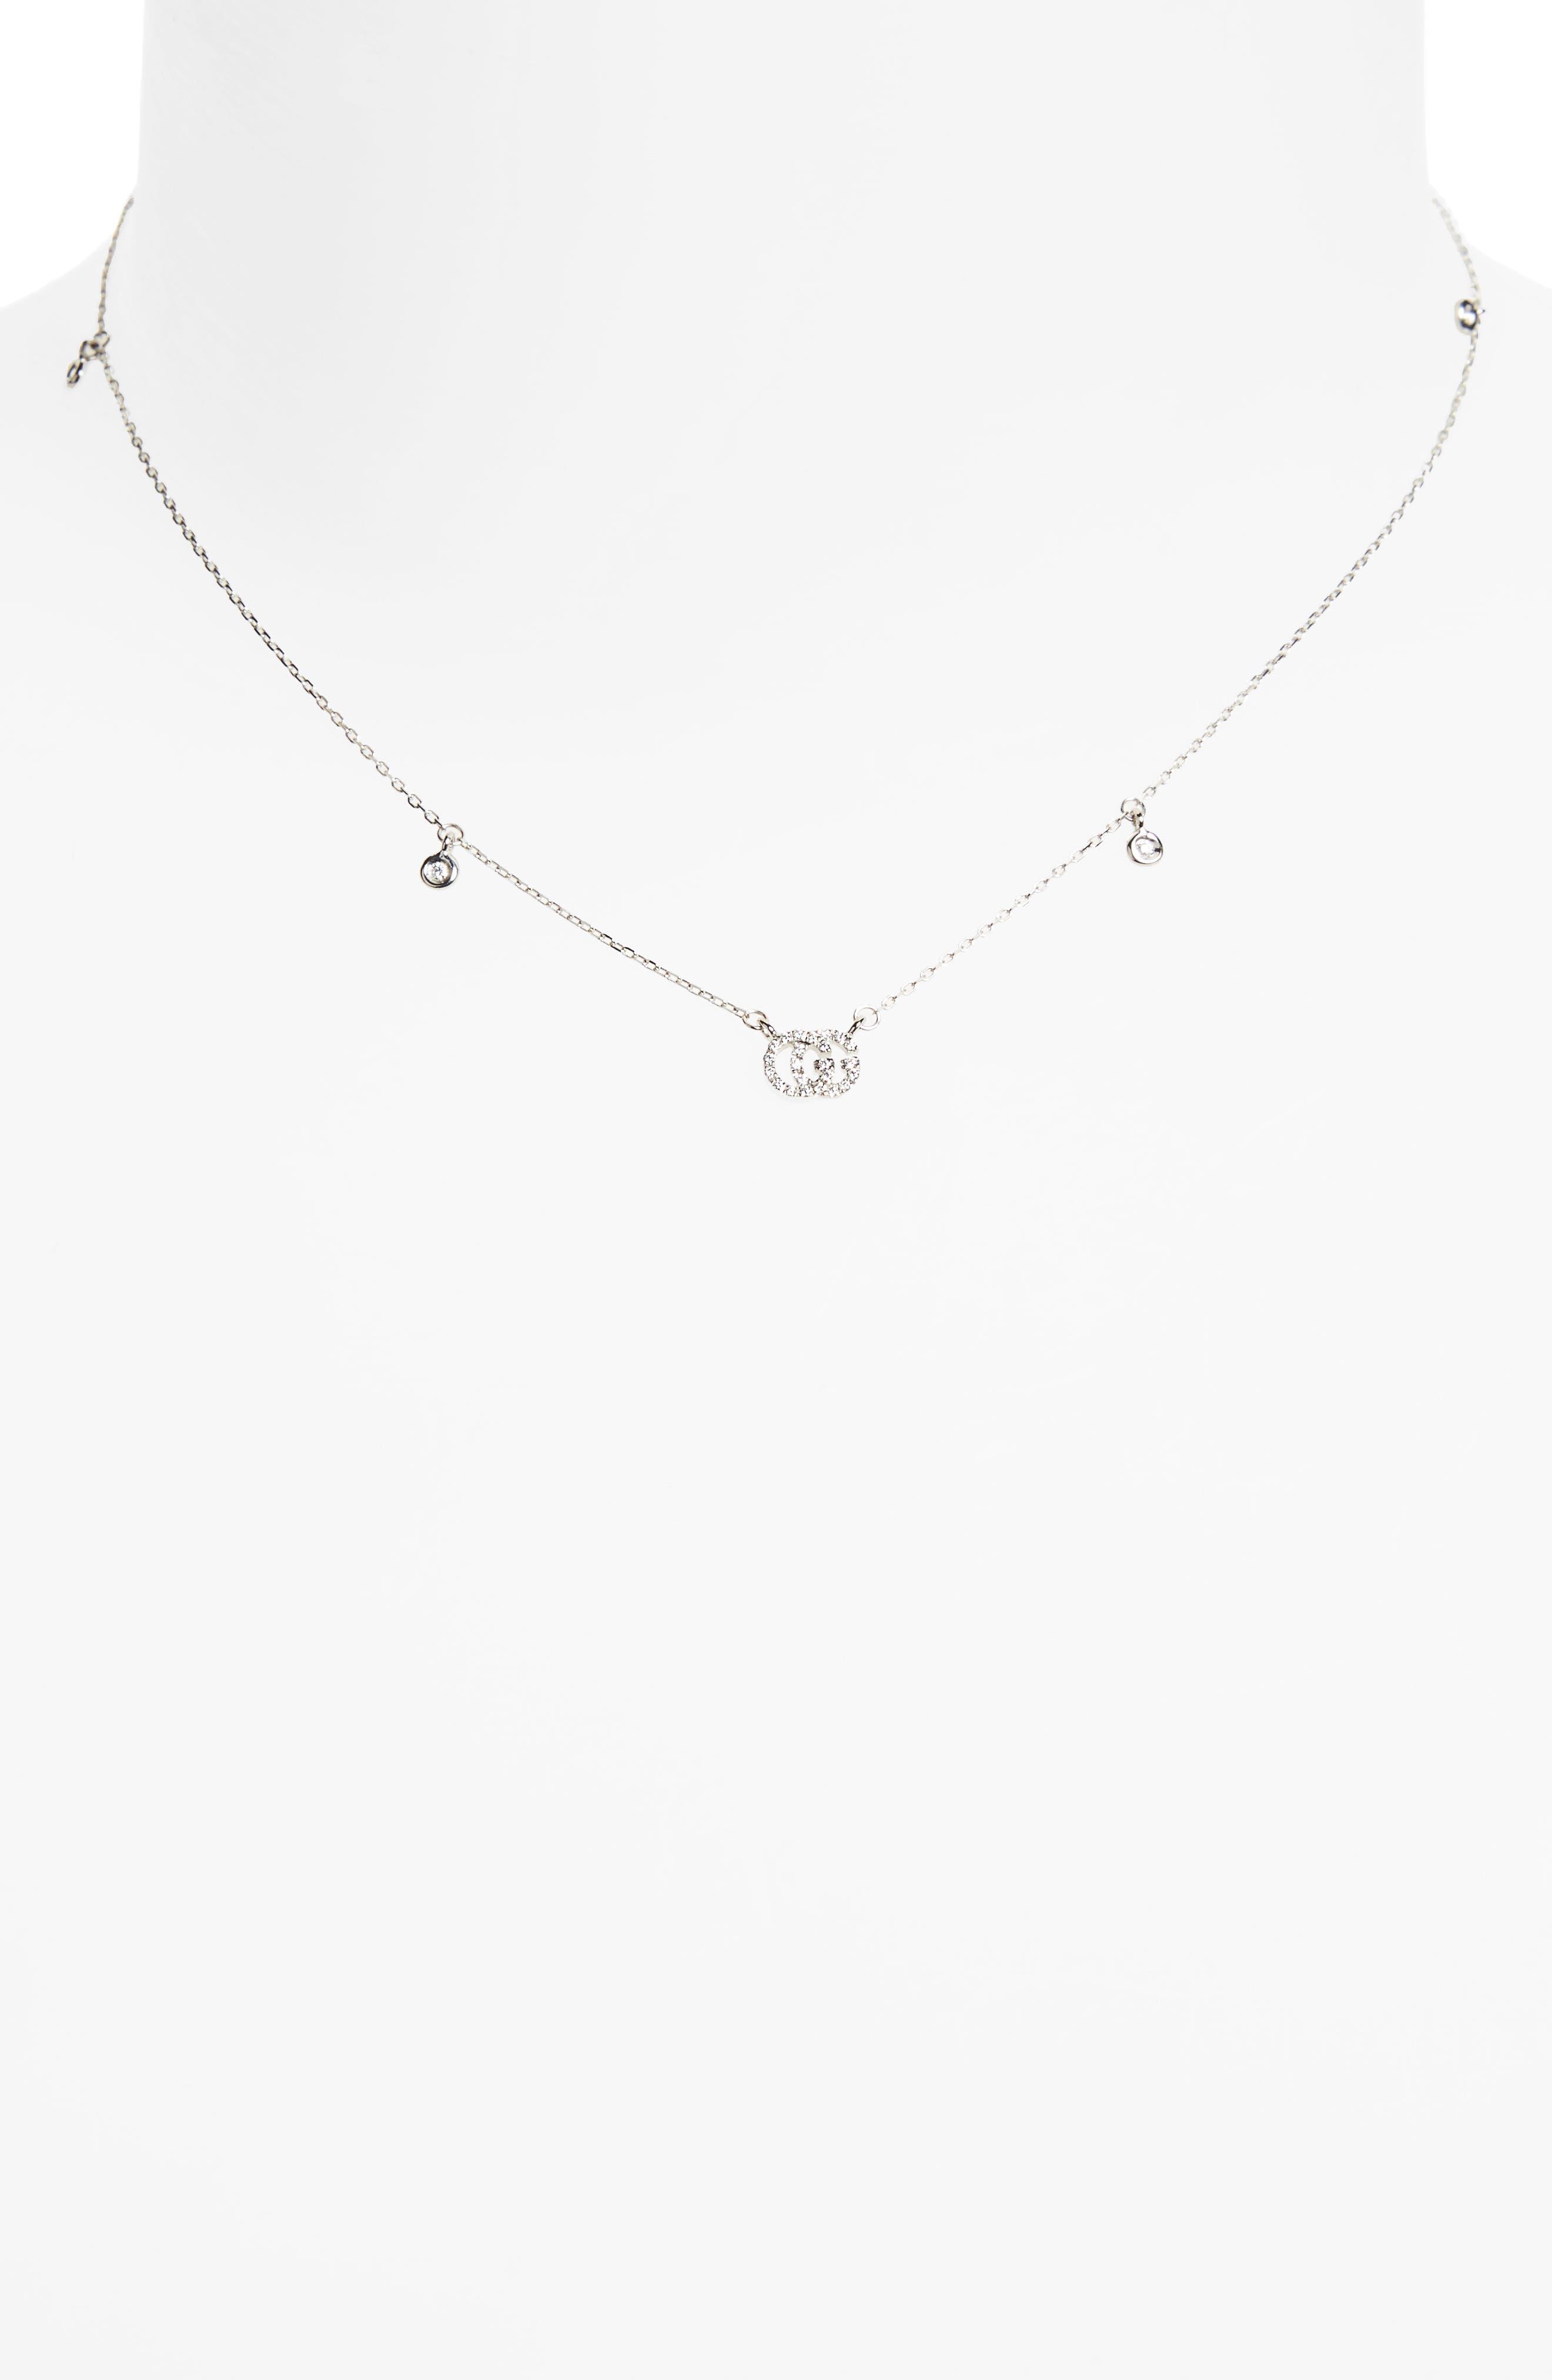 Double-G Diamond Pendant Necklace,                             Alternate thumbnail 2, color,                             WHITE GOLD